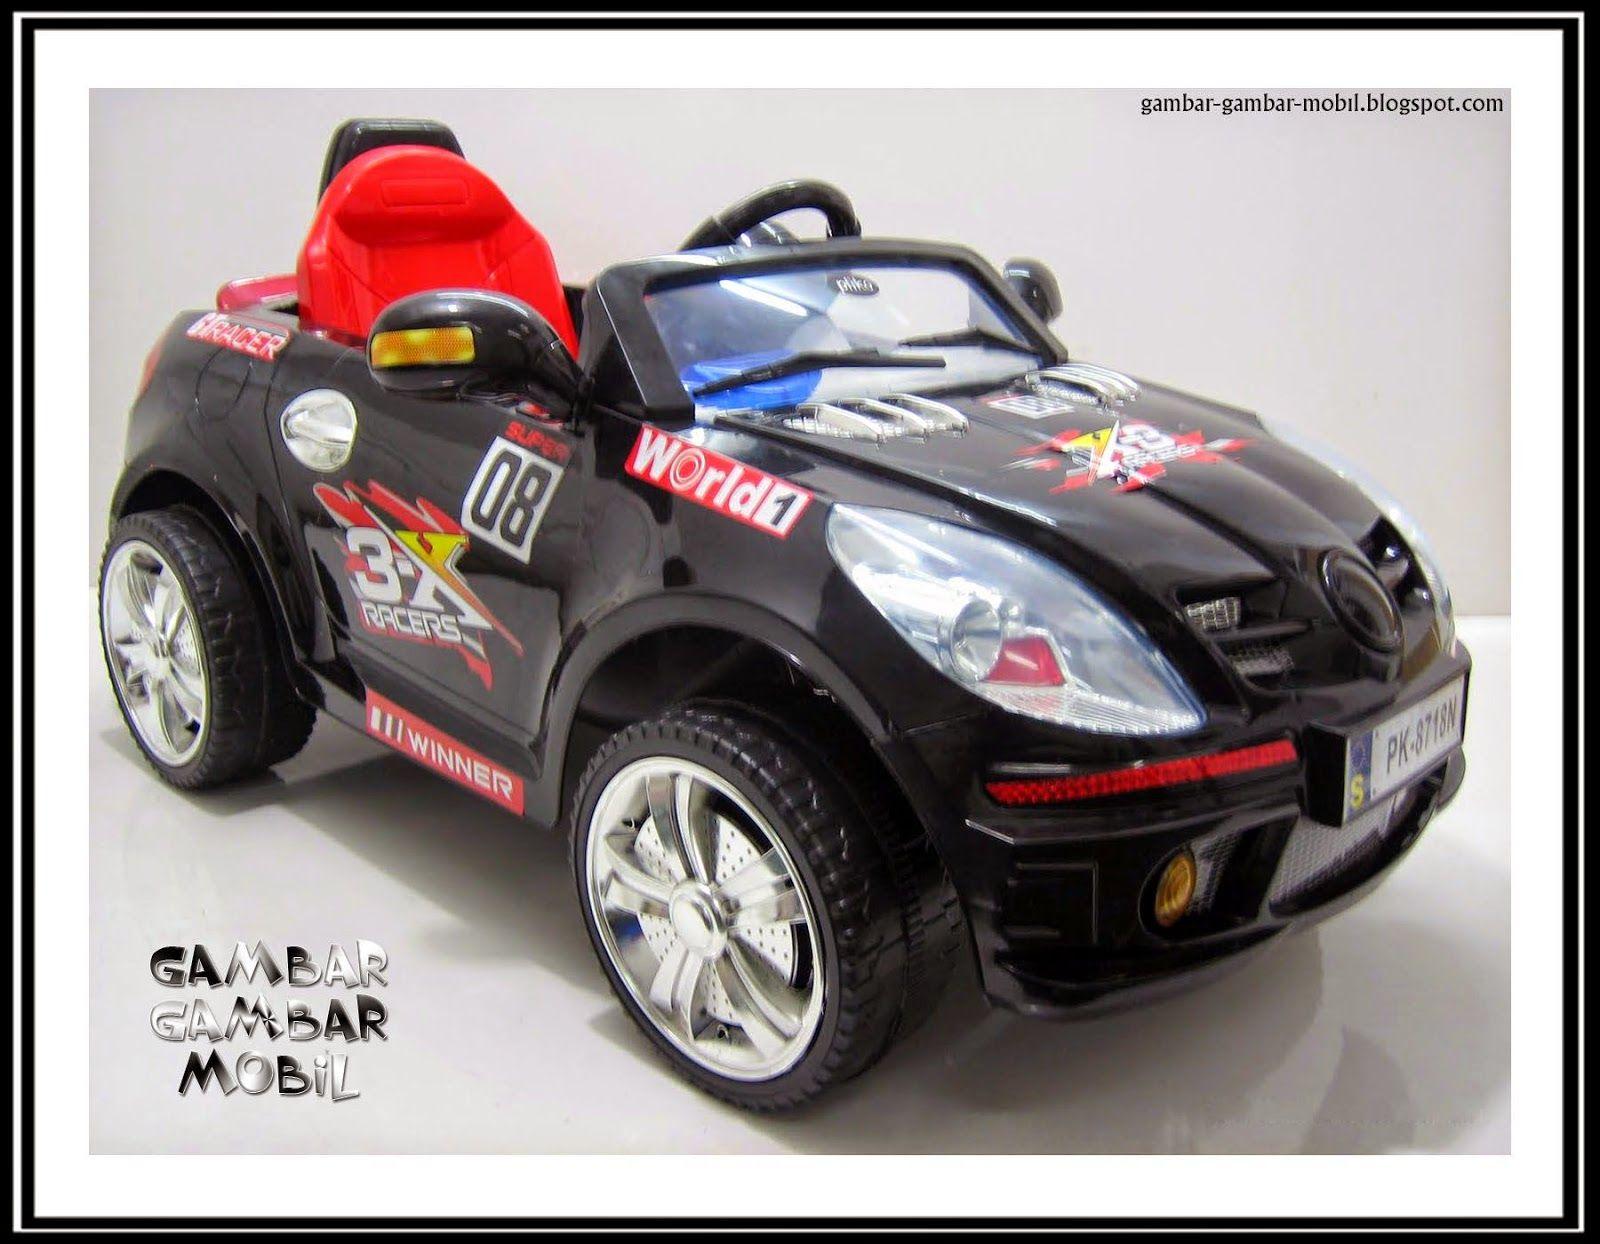 Gambar Mobil Mainan